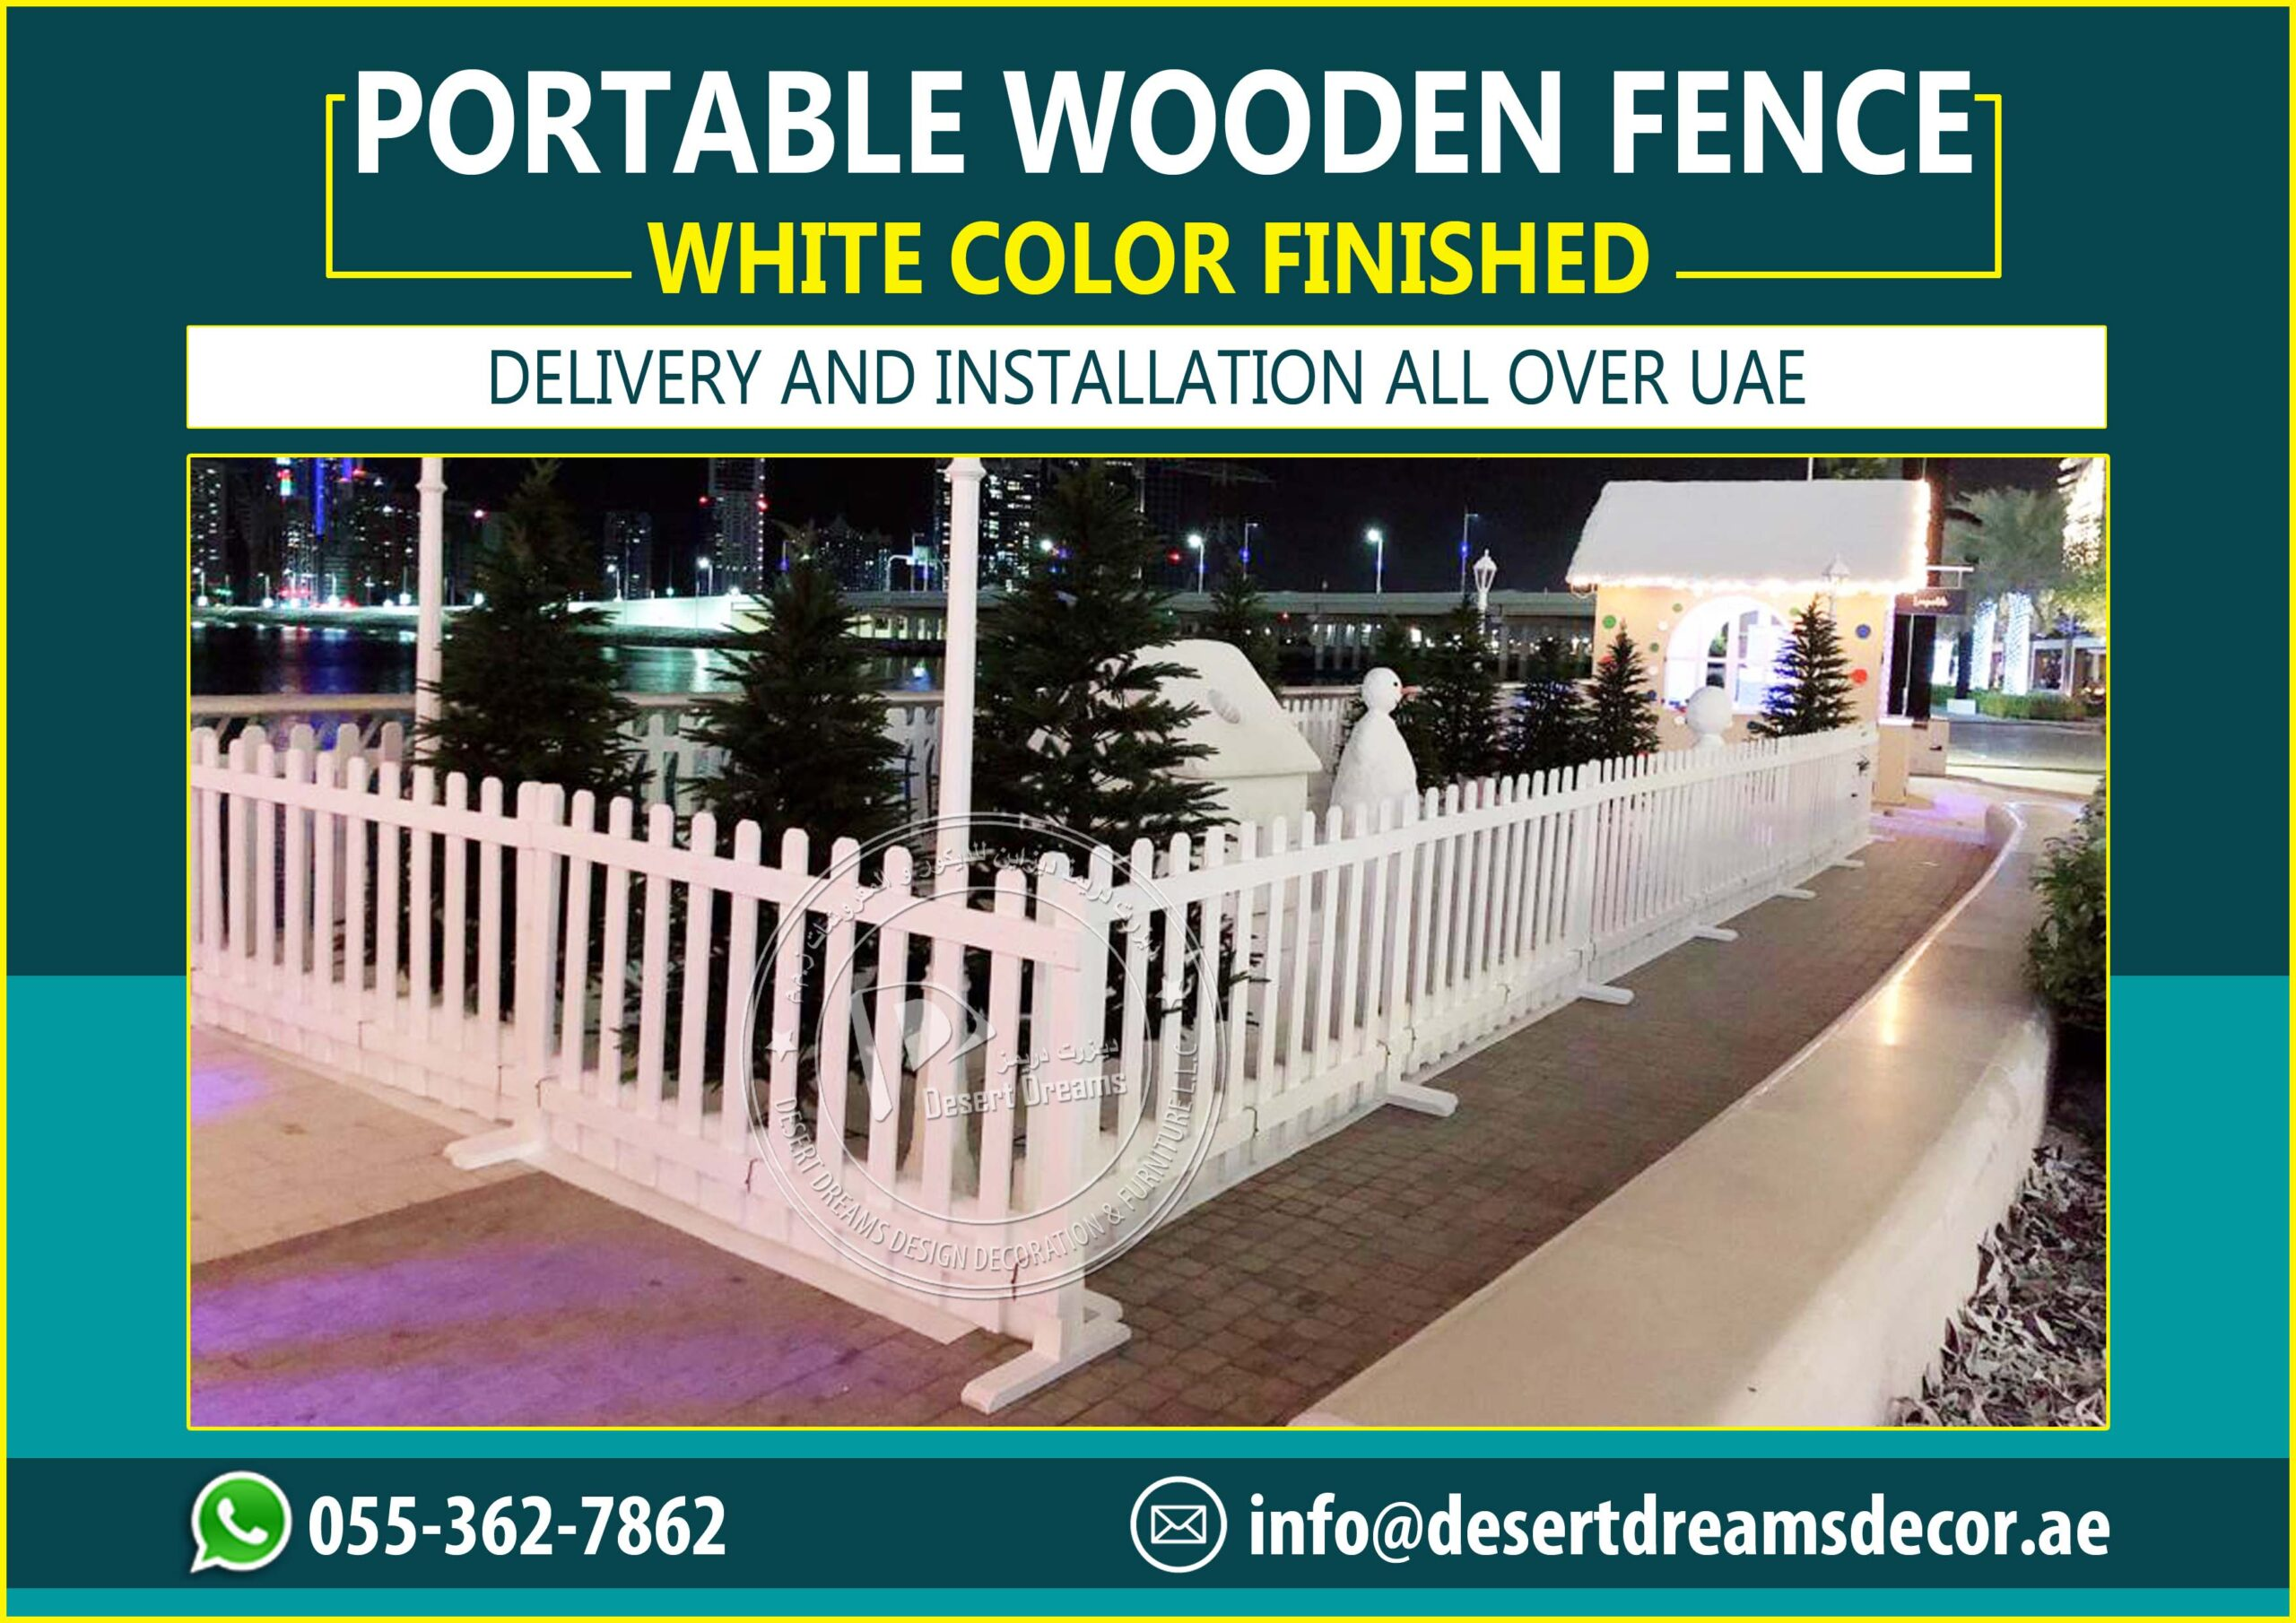 Portable Wooden Fences Suppliers in UAE_Desert Dreams Decor (4).jpg